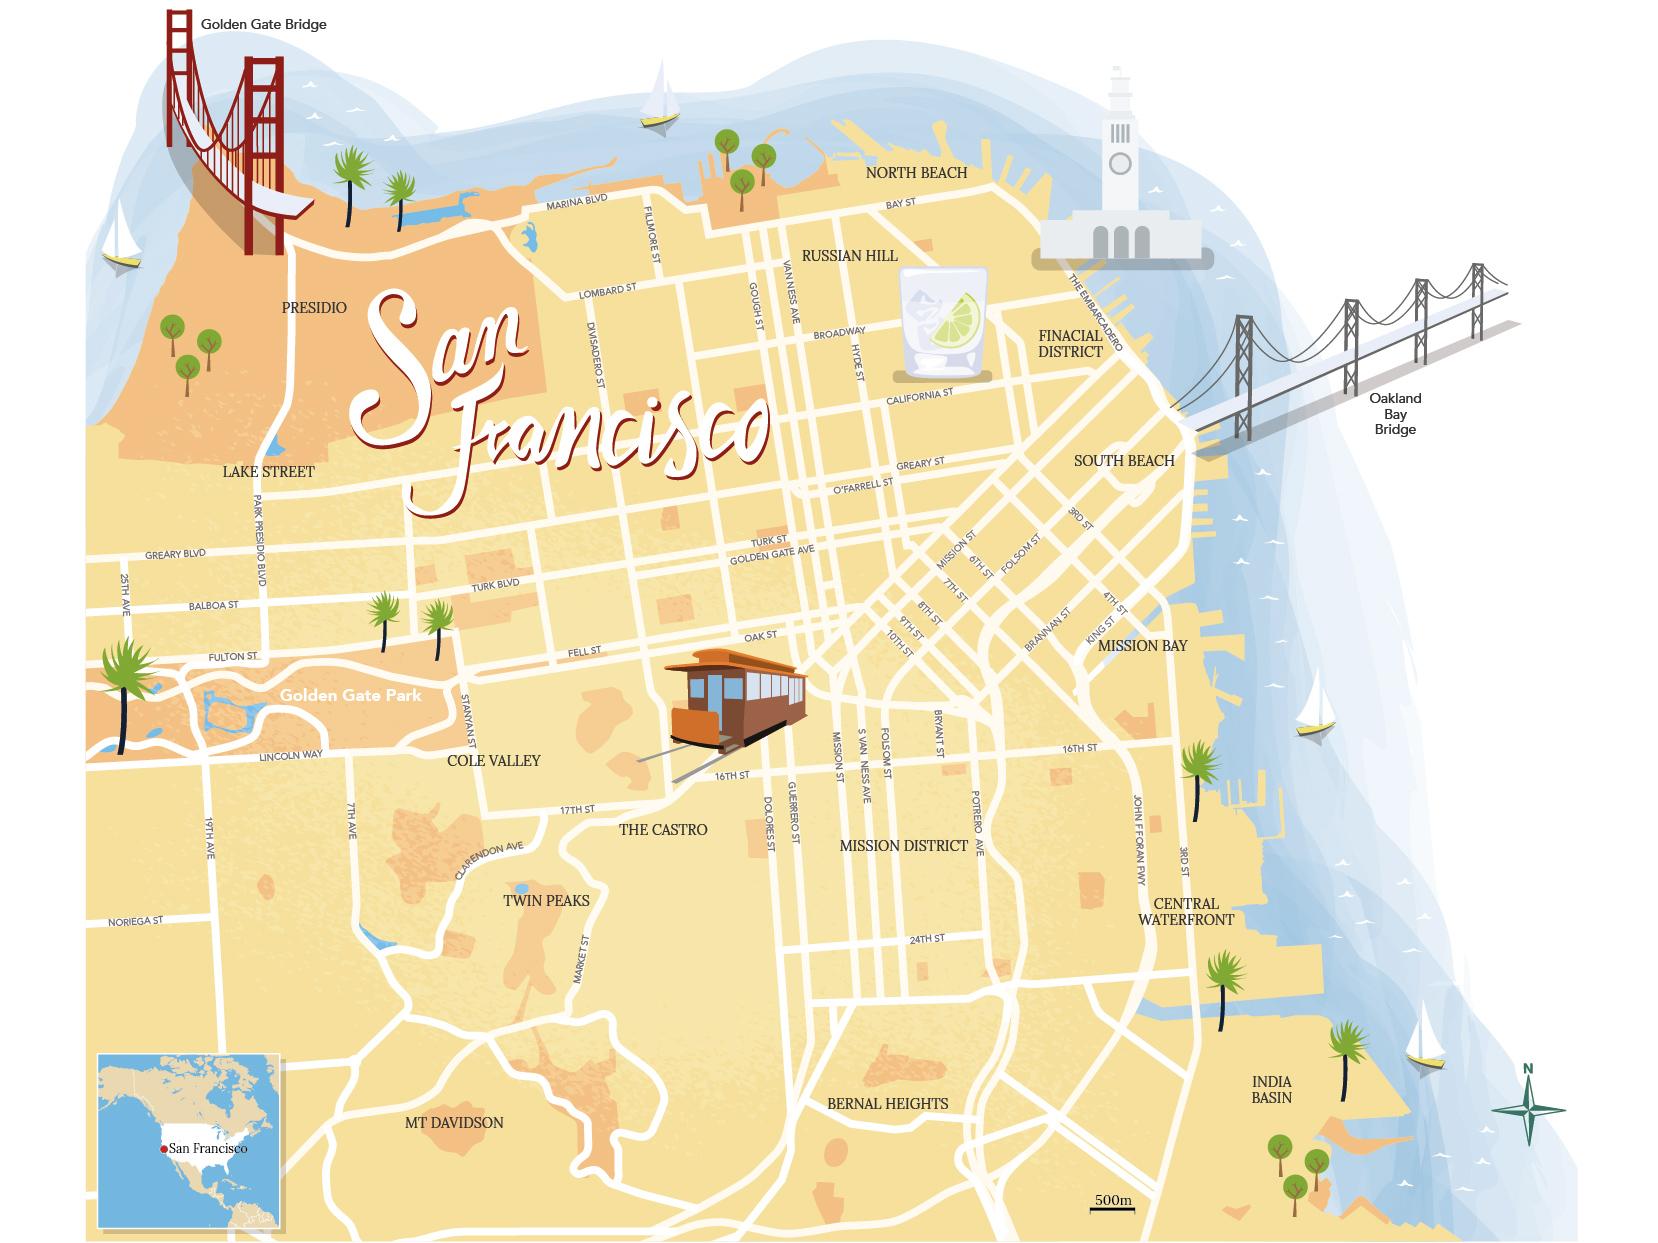 San Francisco illustrated map by Jason Pickersgill on Dribbble on 9th street tijuana, 9th street green bay, 9th street durham, 9th street corpus christi, washington square park san francisco, broadway san francisco,